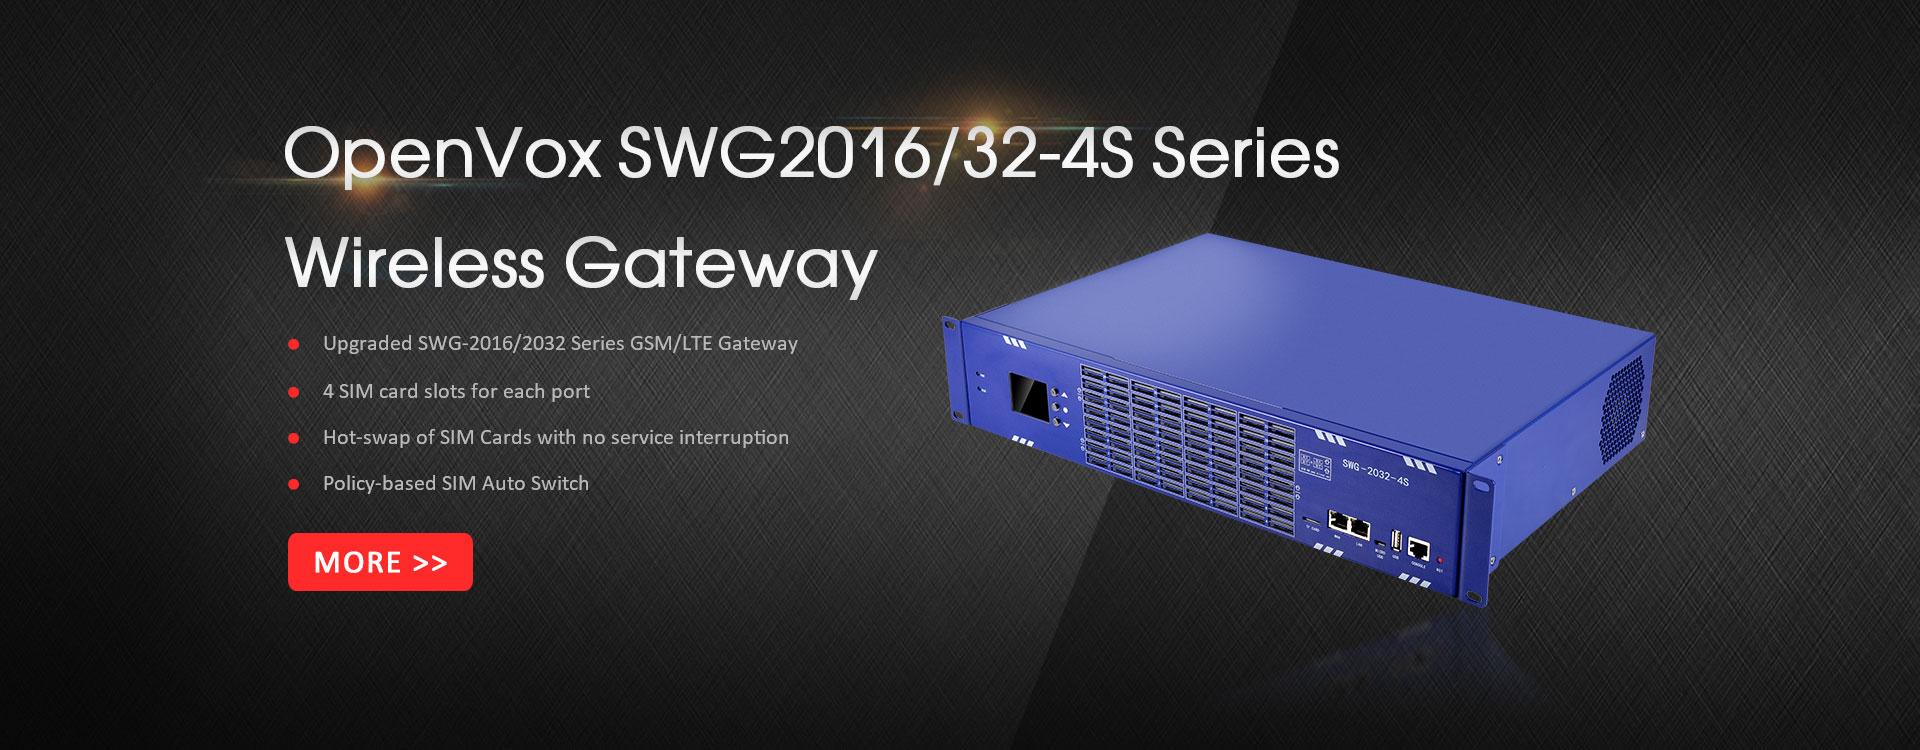 SWG2016-32-4S